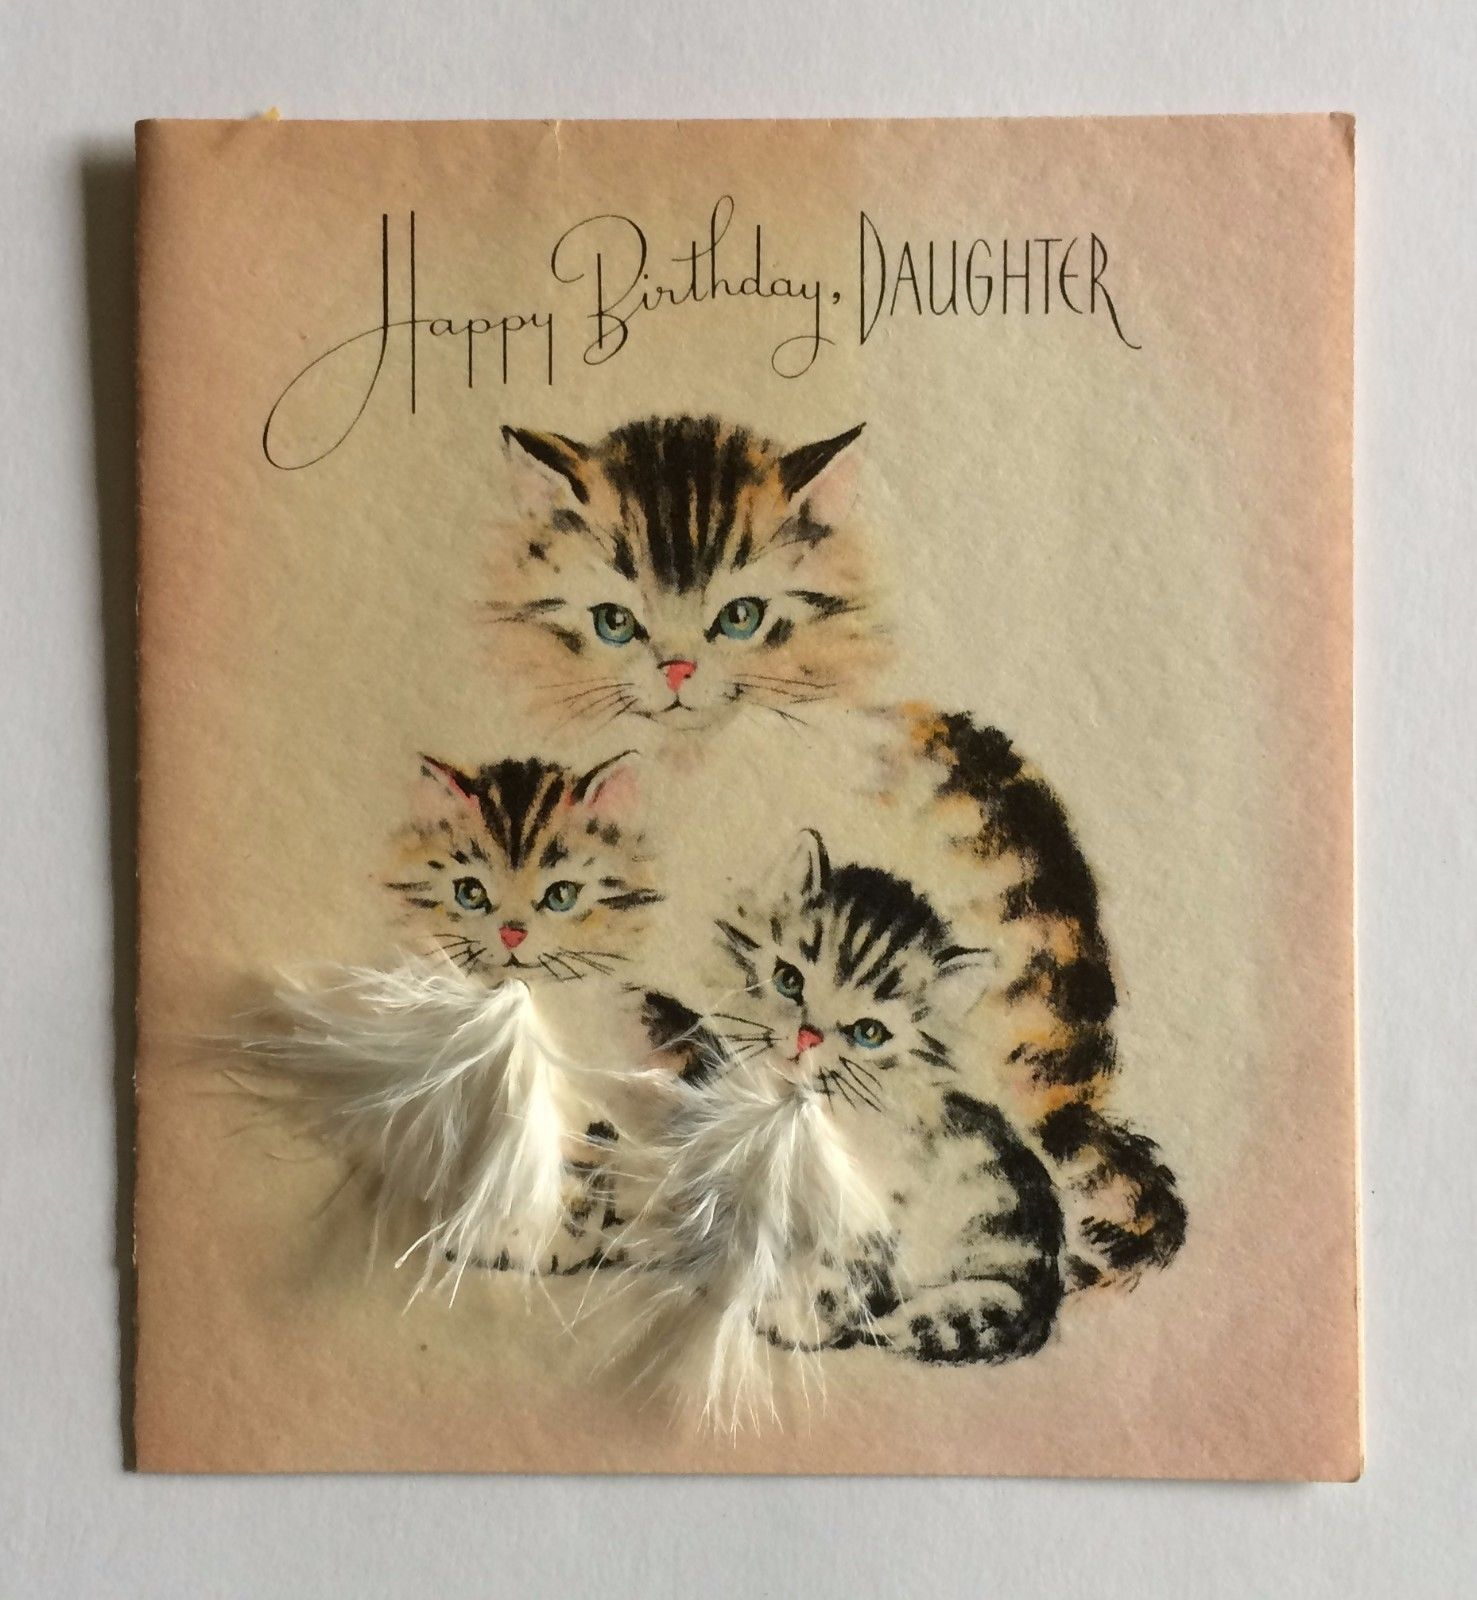 Kitty cats feather fur birthday greeting card happy birthday kitty cats feather fur birthday greeting card kristyandbryce Gallery